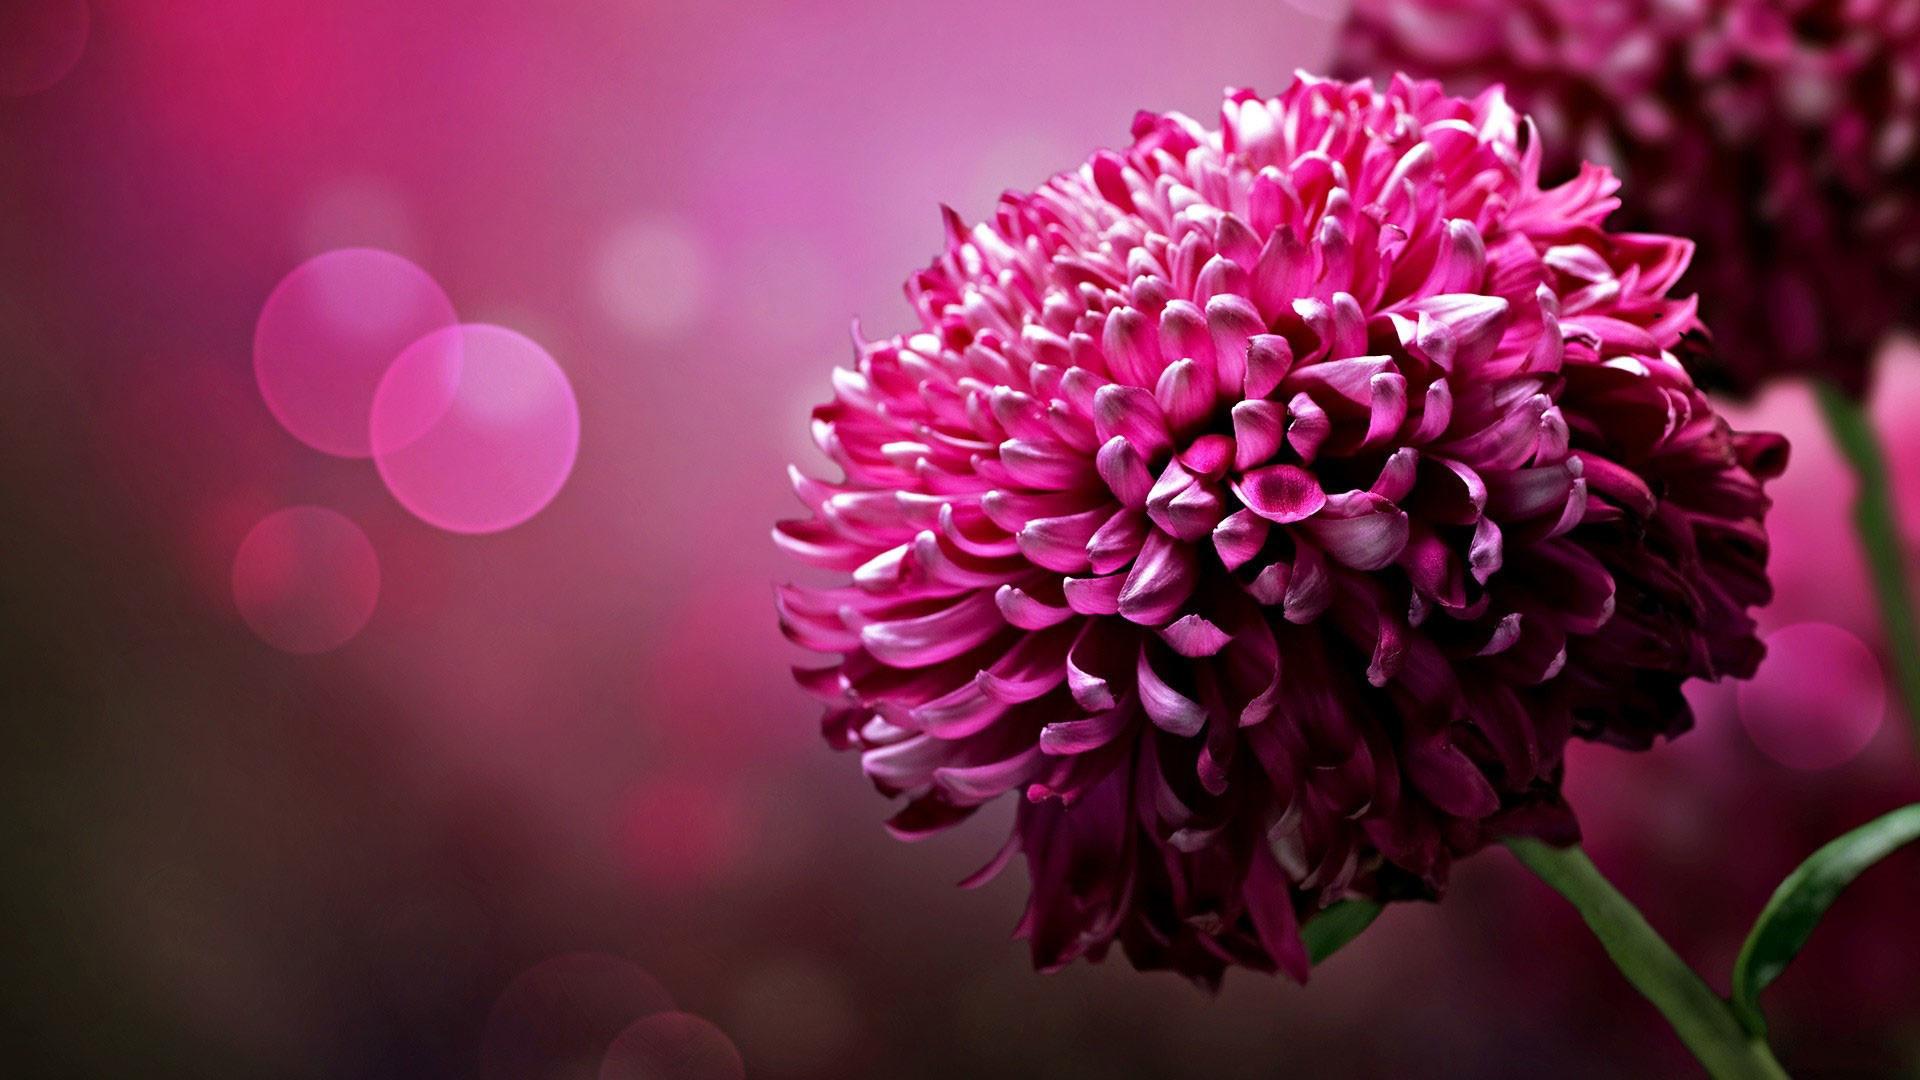 … flowers cute dark pink desktop background wallpaper 1080p hd image …